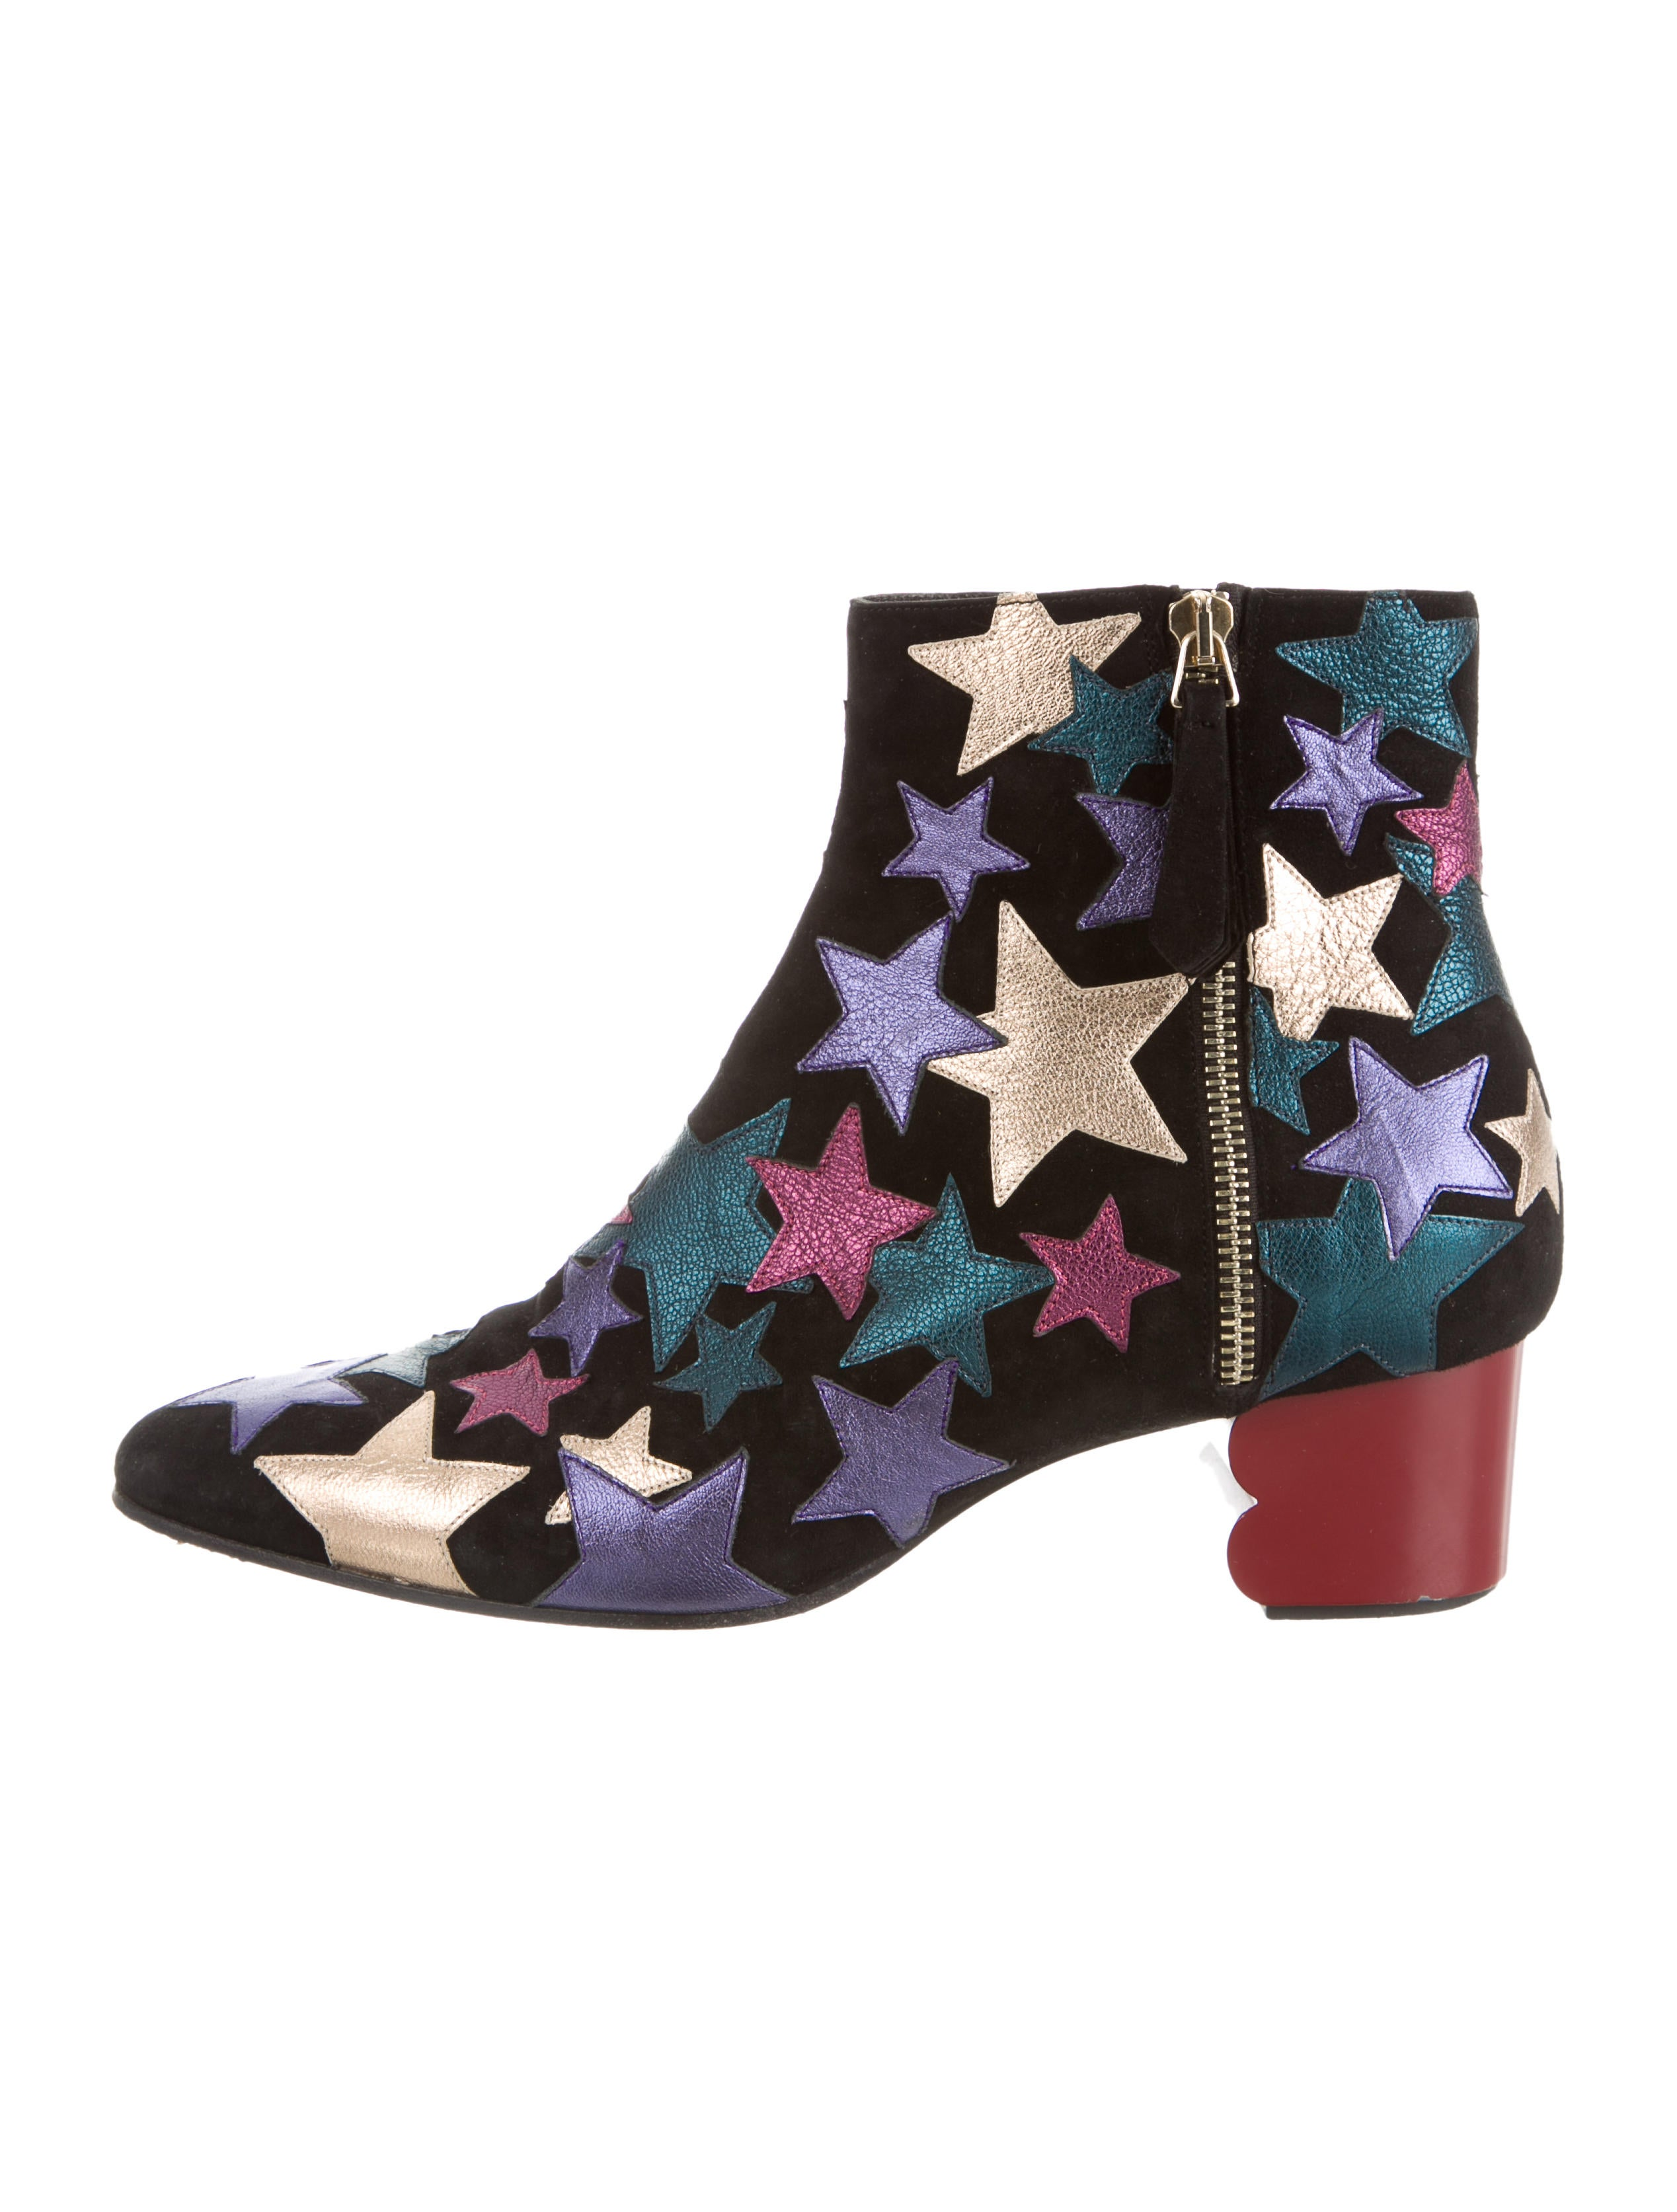 c72d12d335d5 Tommy Hilfiger Collection Metallic Star Ankle Boots - Shoes ...